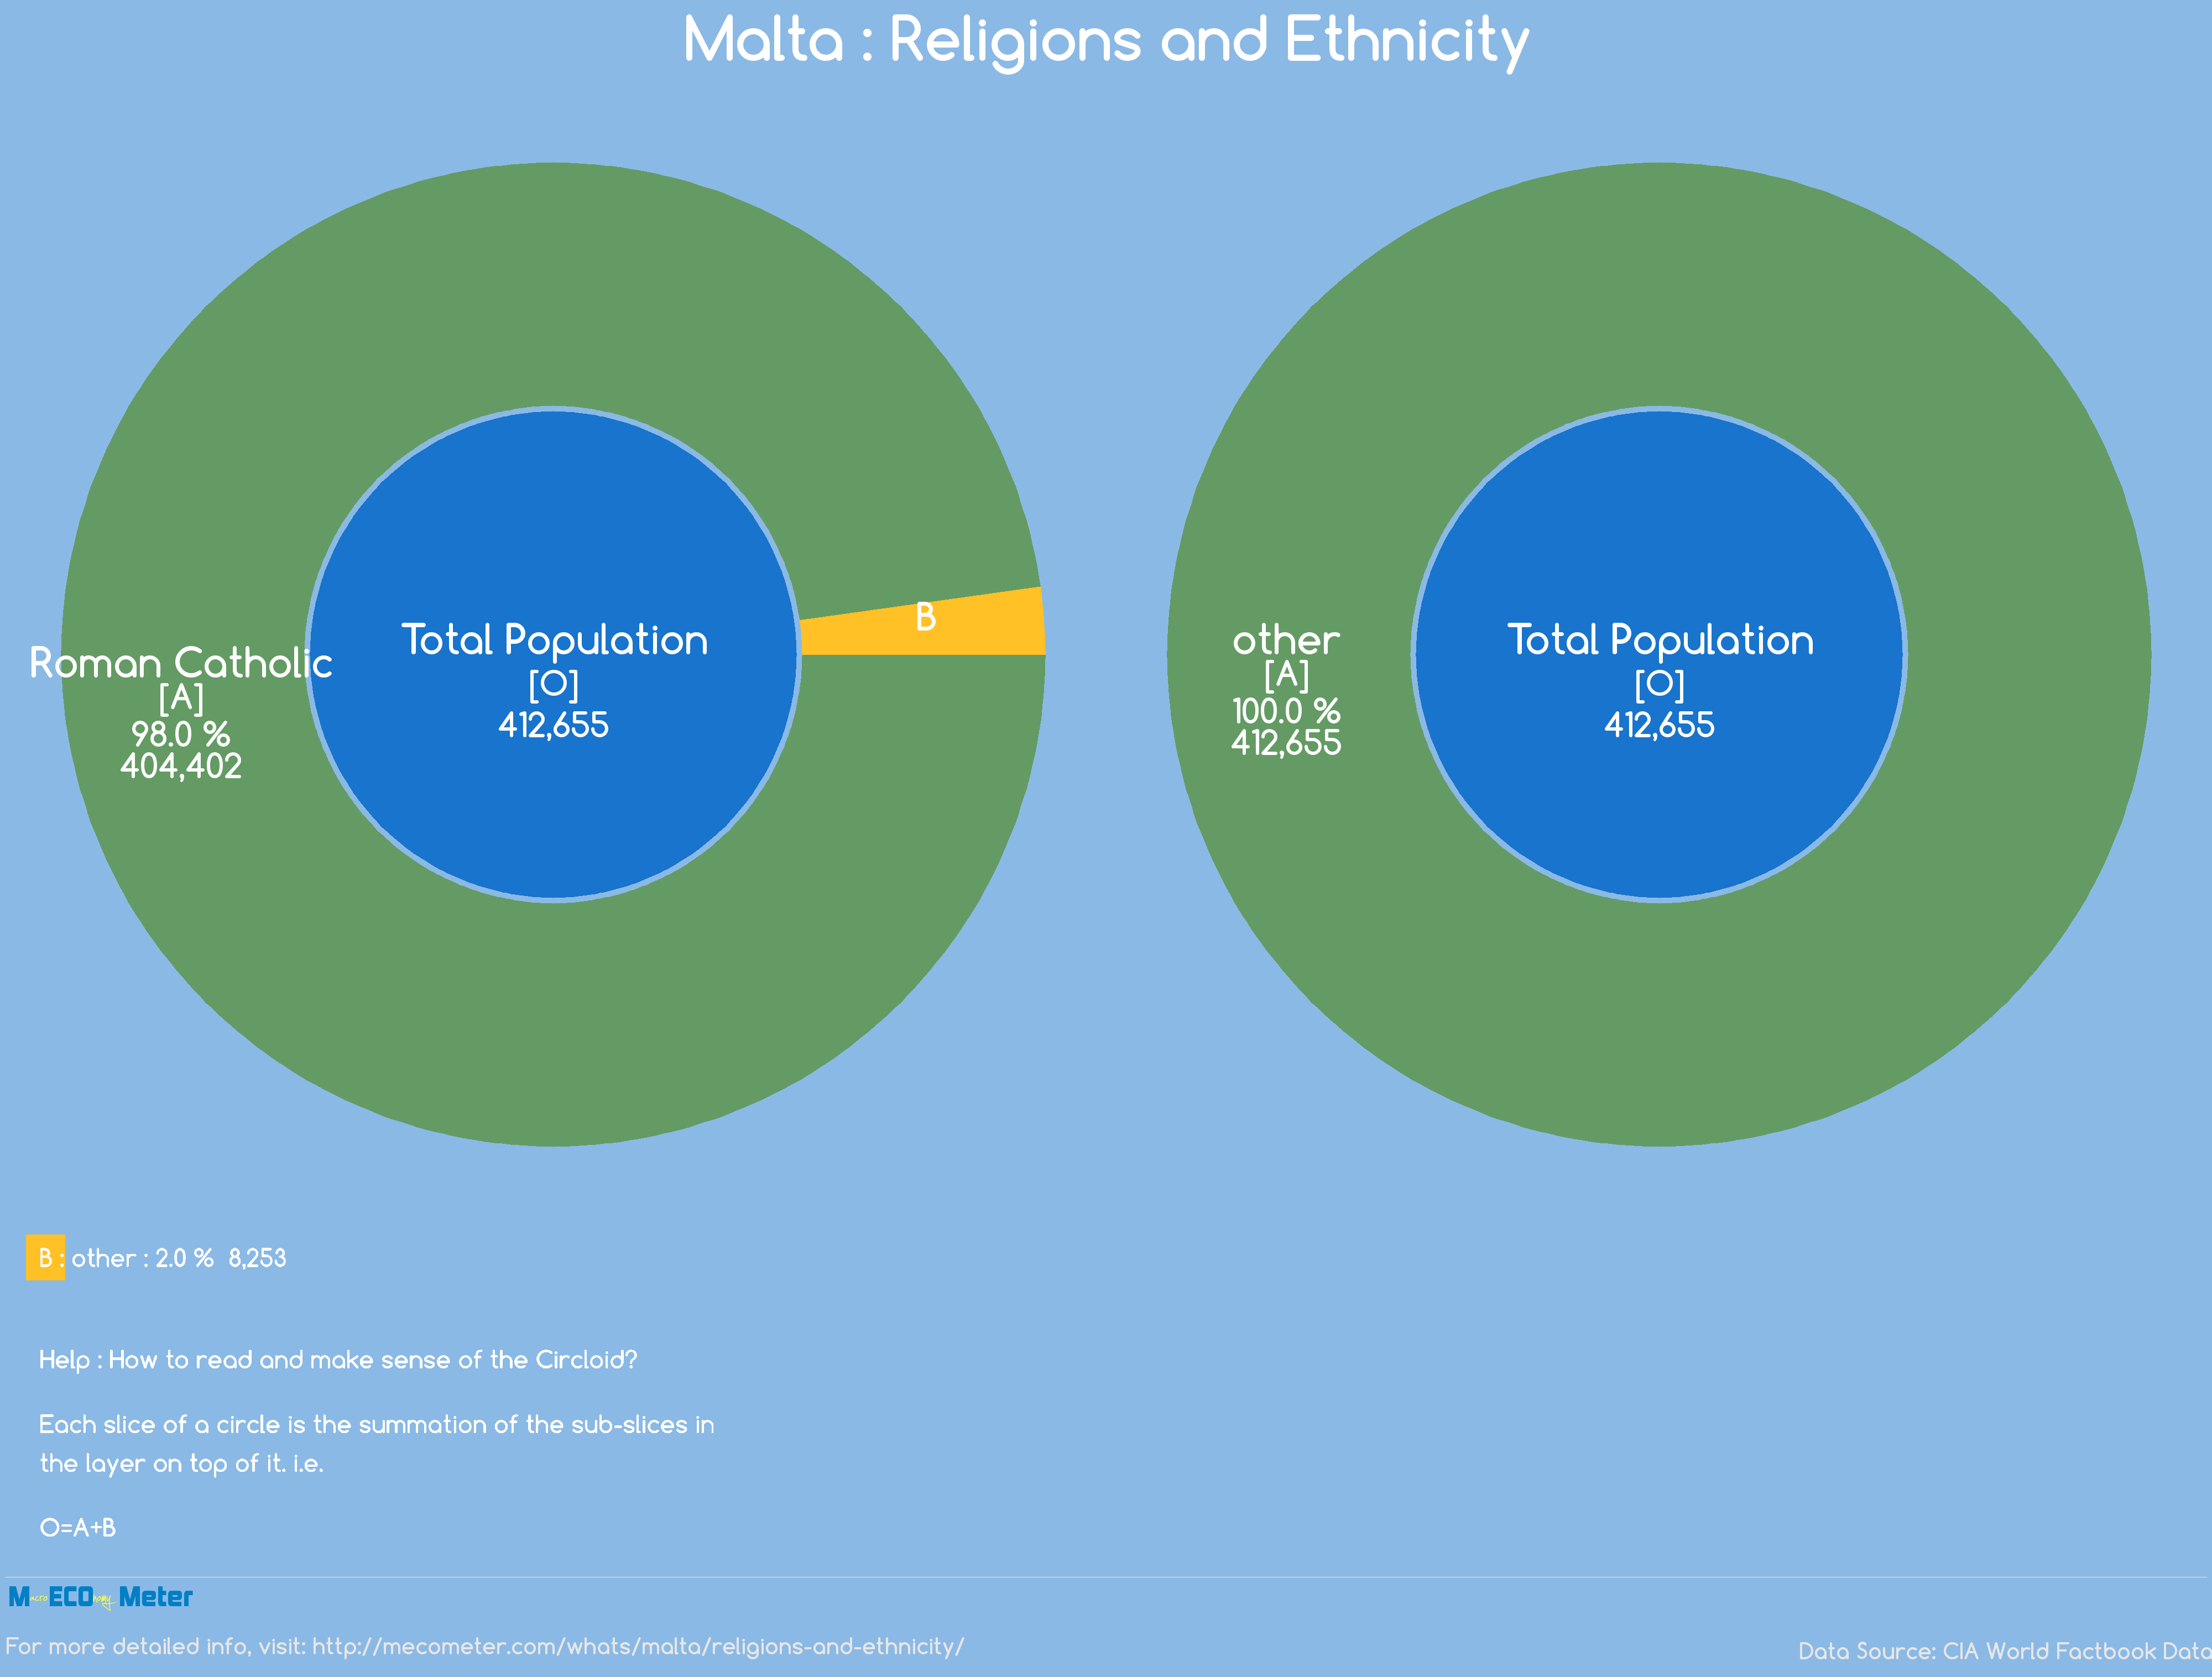 Malta : Religions and Ethnicity